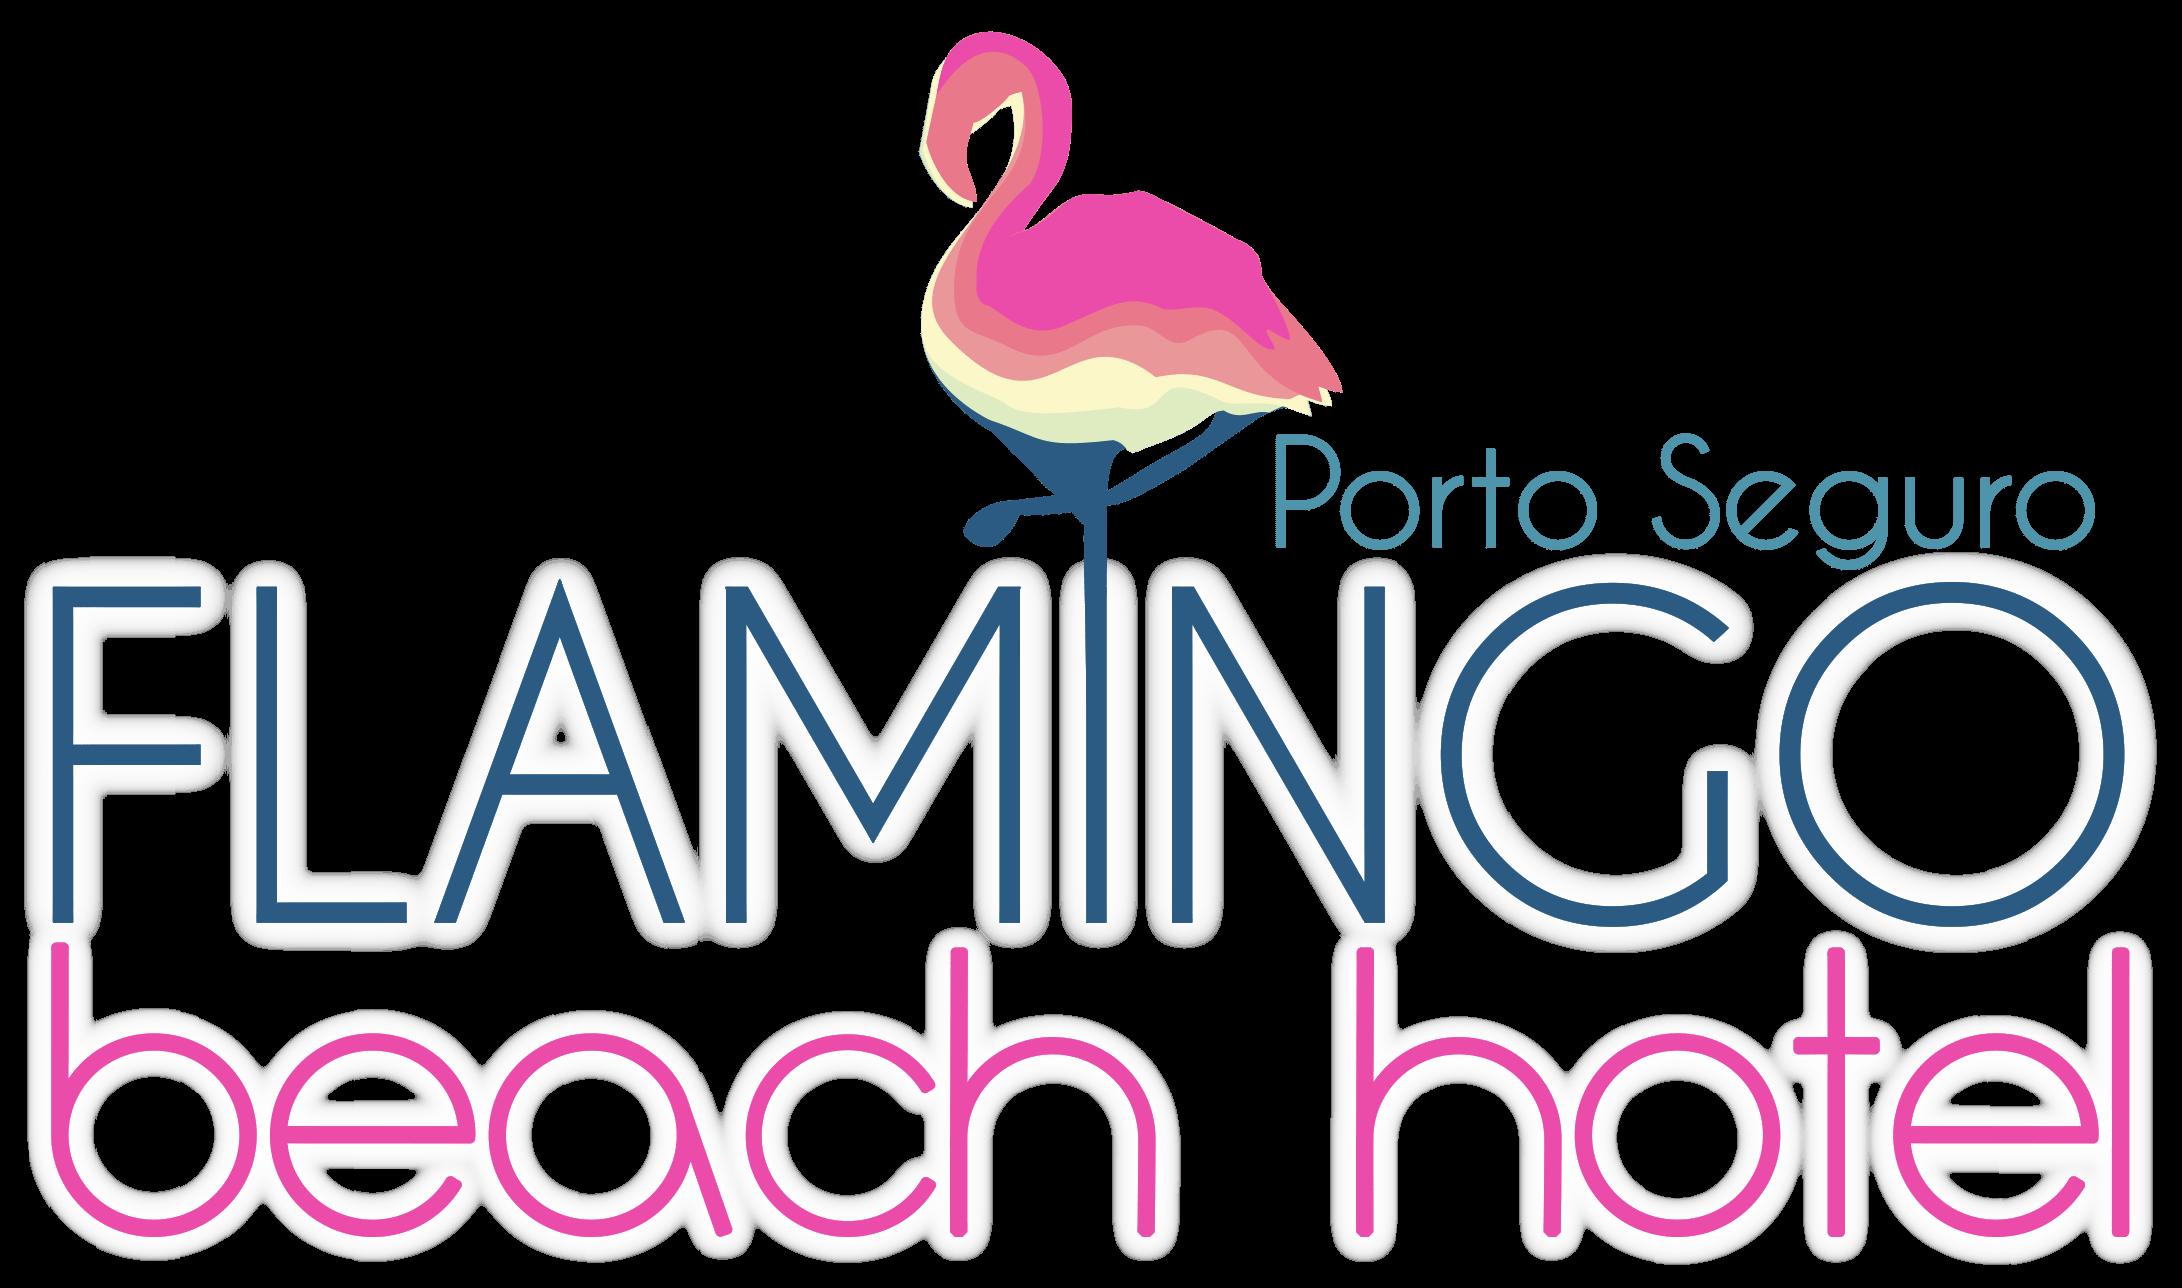 Flamingo BEach Logo